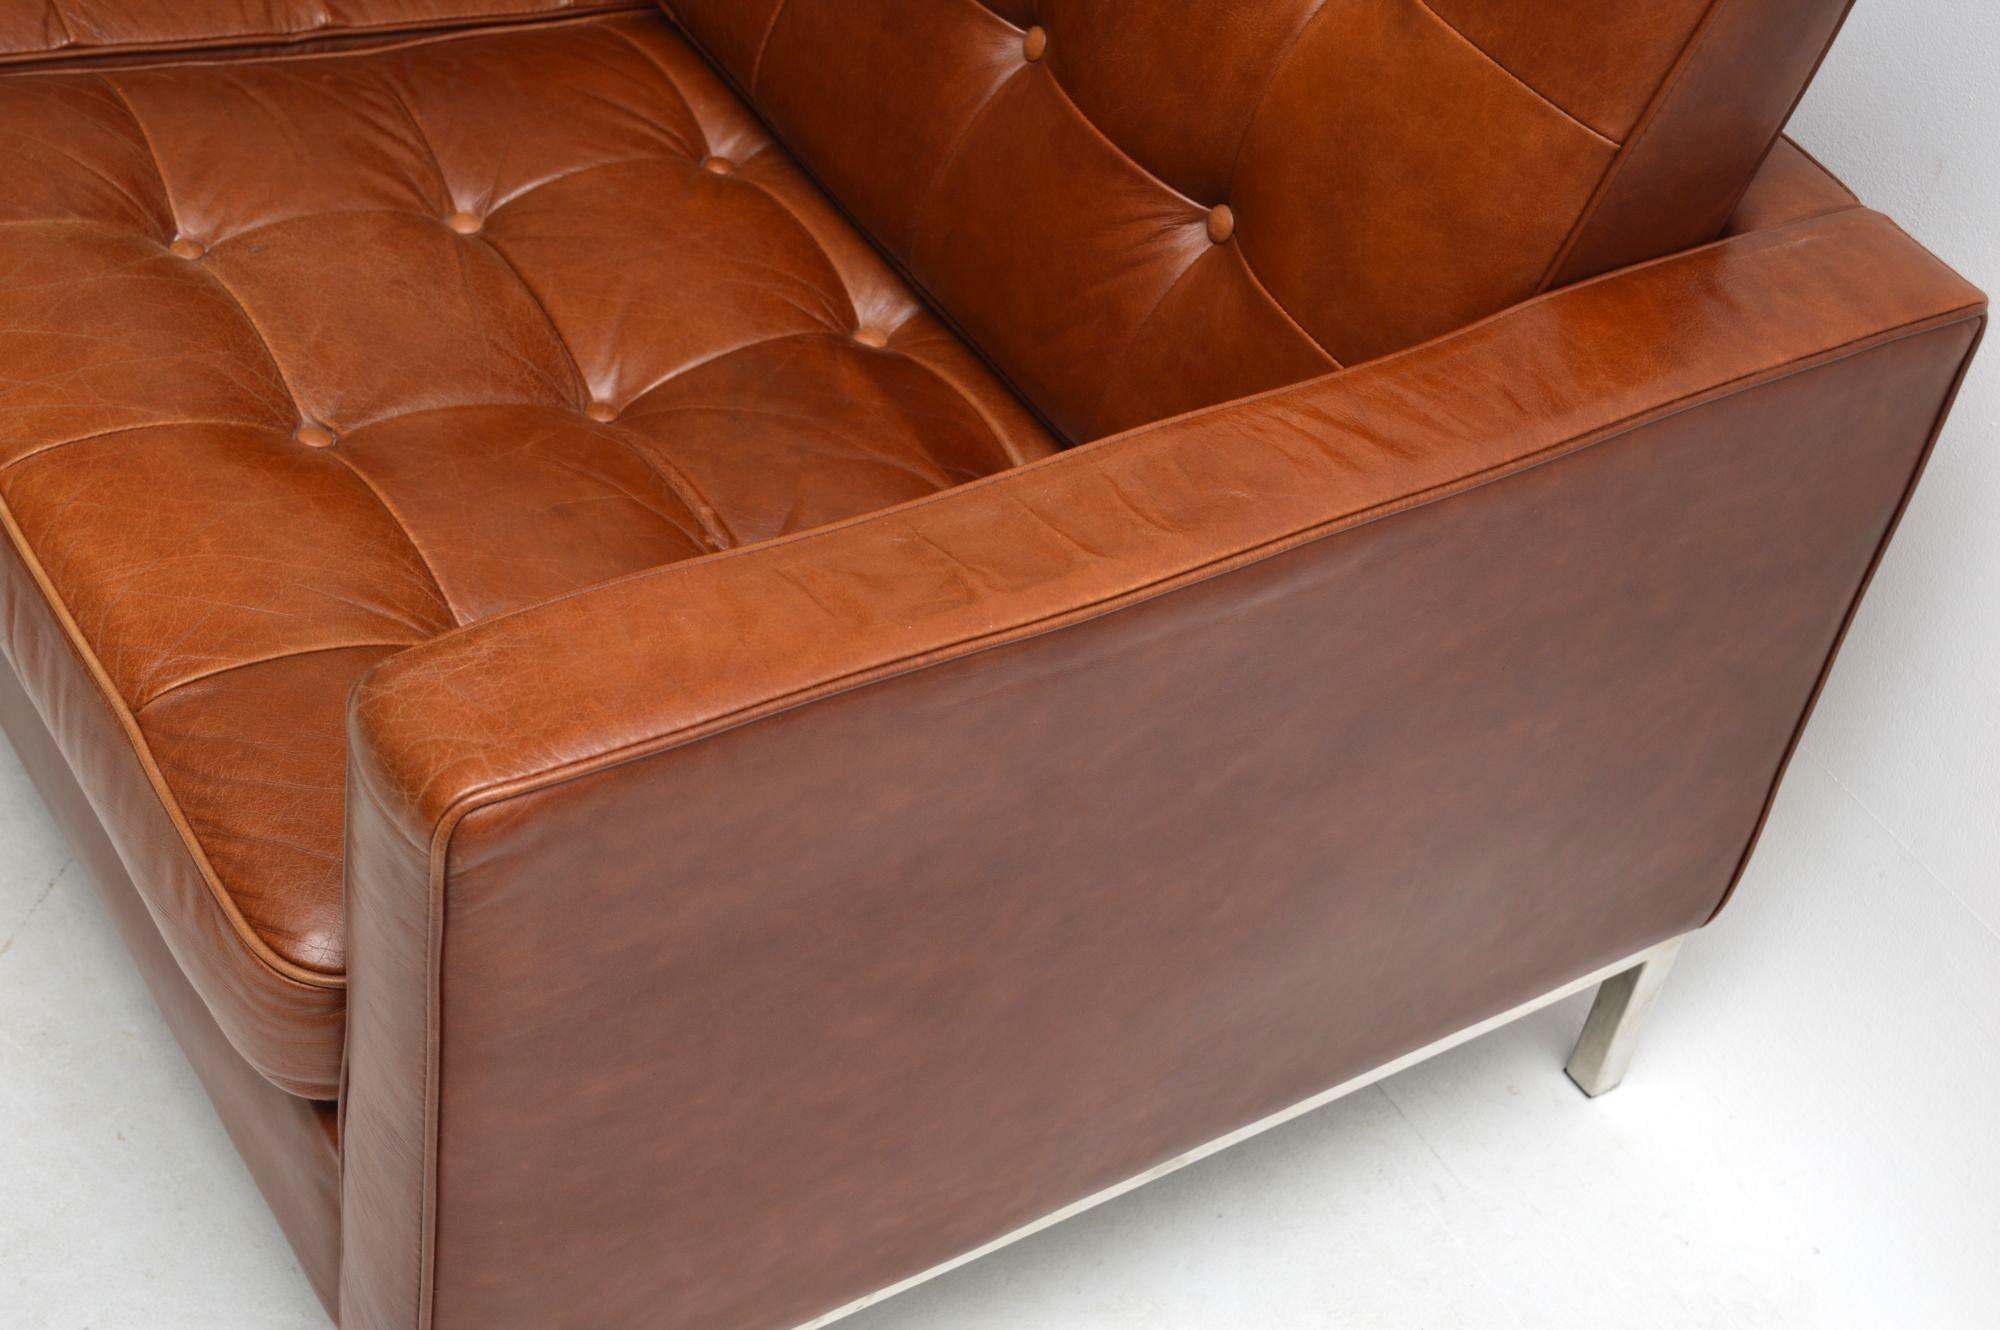 Vintage Florence Knoll Leather Amp Chrome Sofa